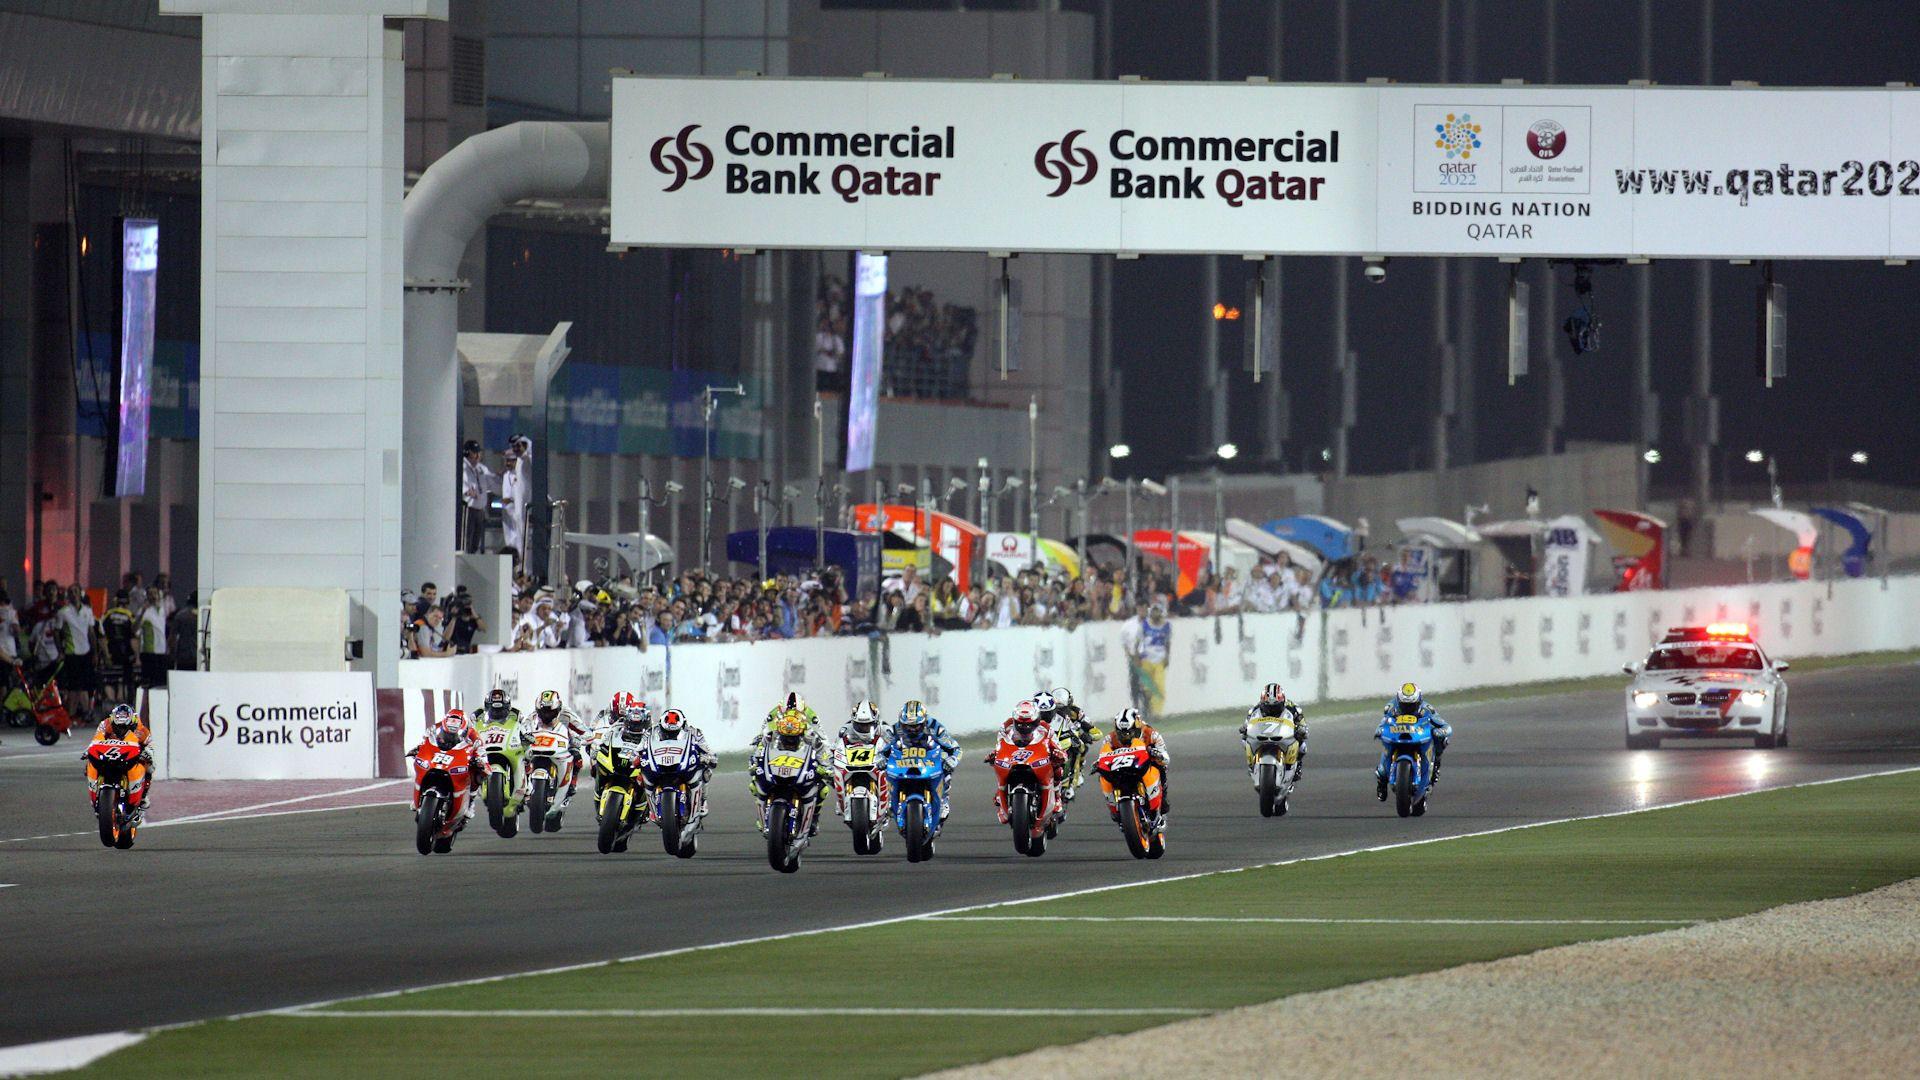 grand prix du qatar moto gp mycanal. Black Bedroom Furniture Sets. Home Design Ideas